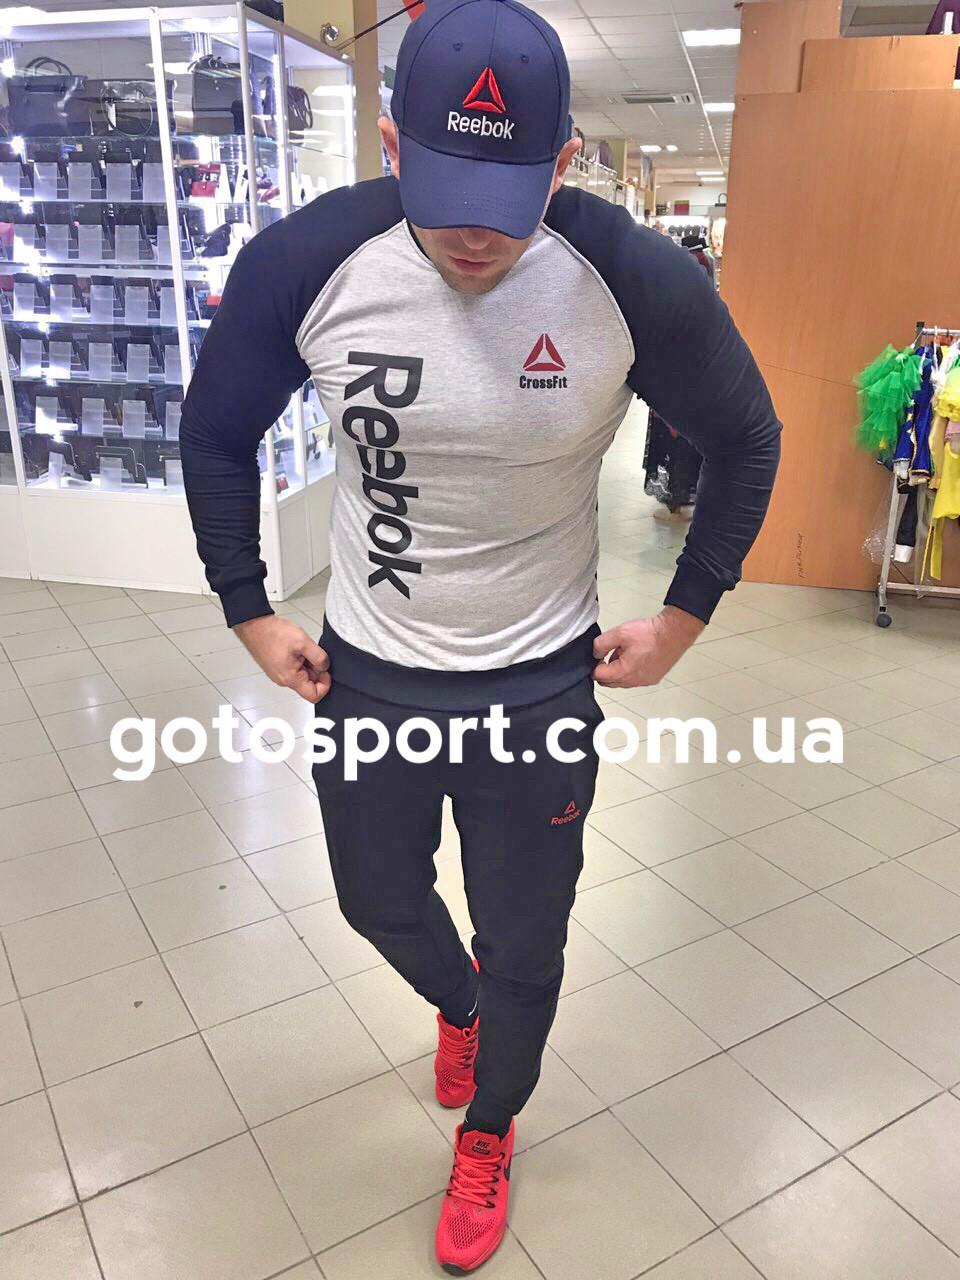 2e62f4a6 Спортивный мужской костюм Reebok CrossFit: продажа, цена в Киеве ...